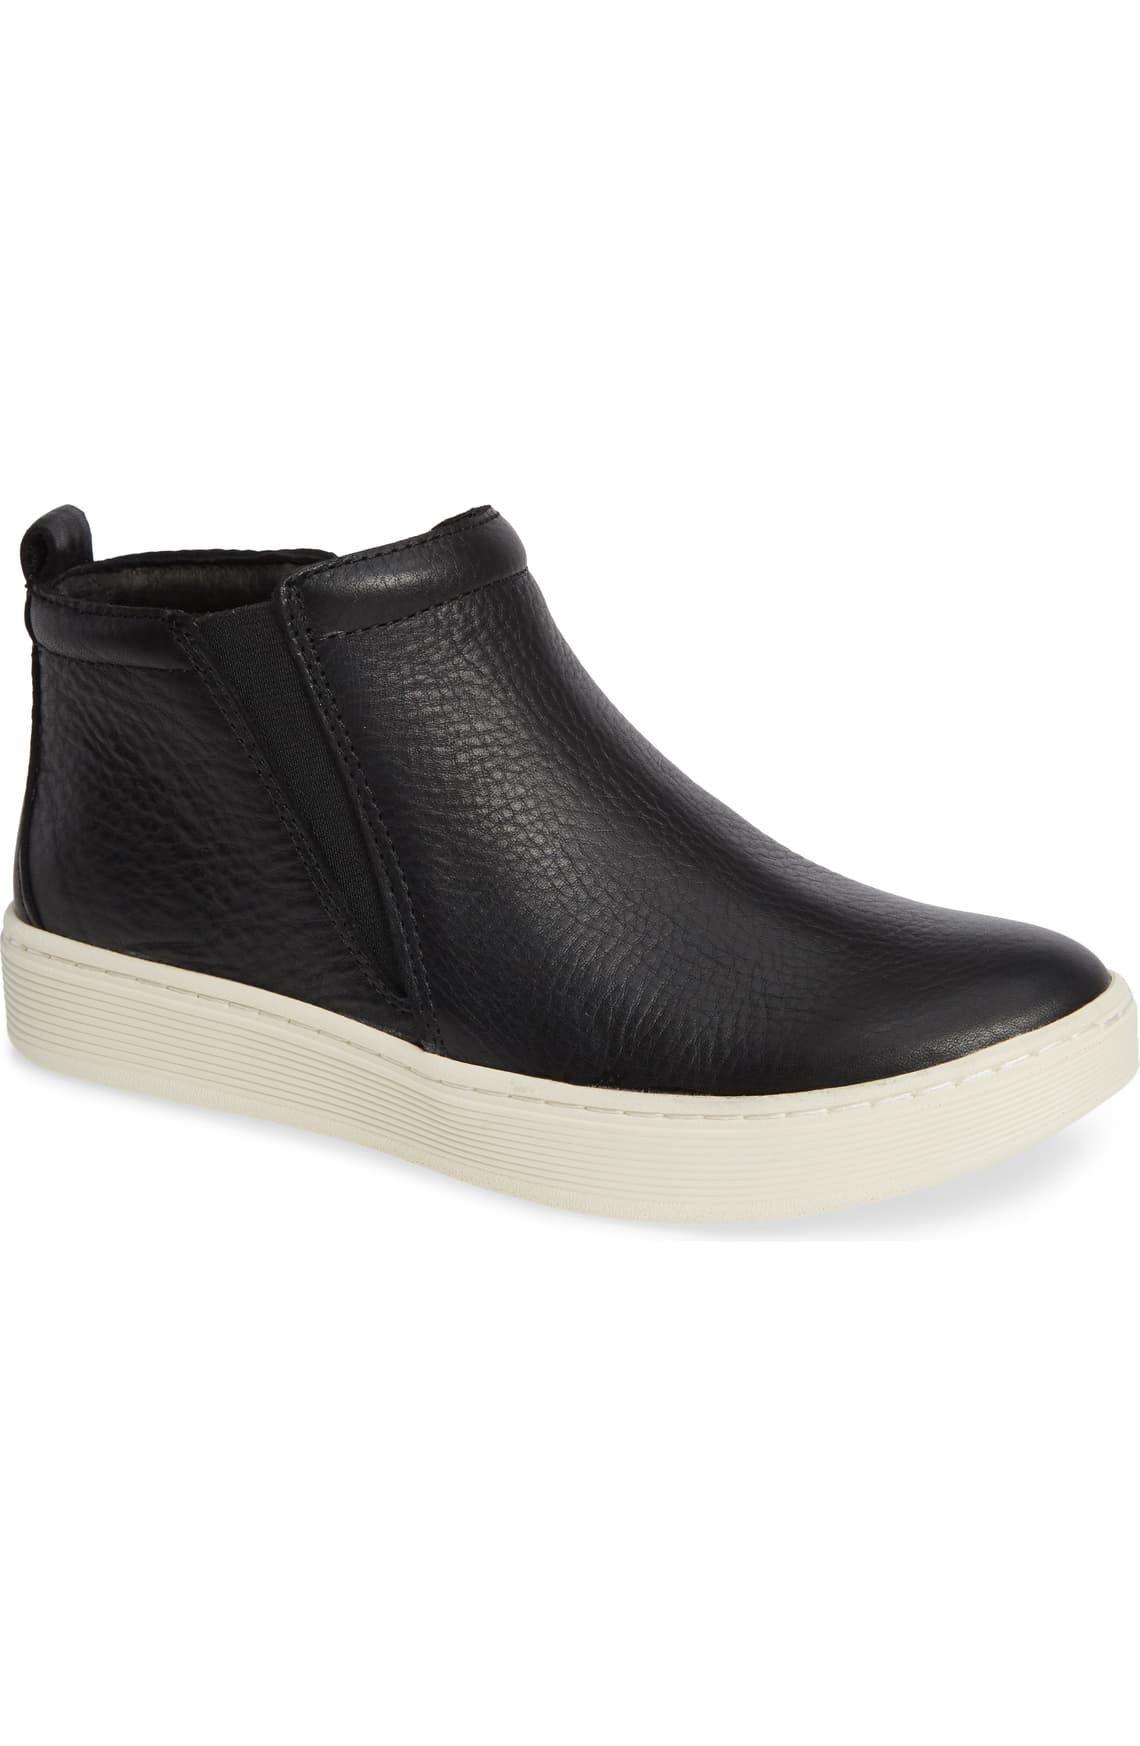 Britton II Waterproof Sneaker Bootie